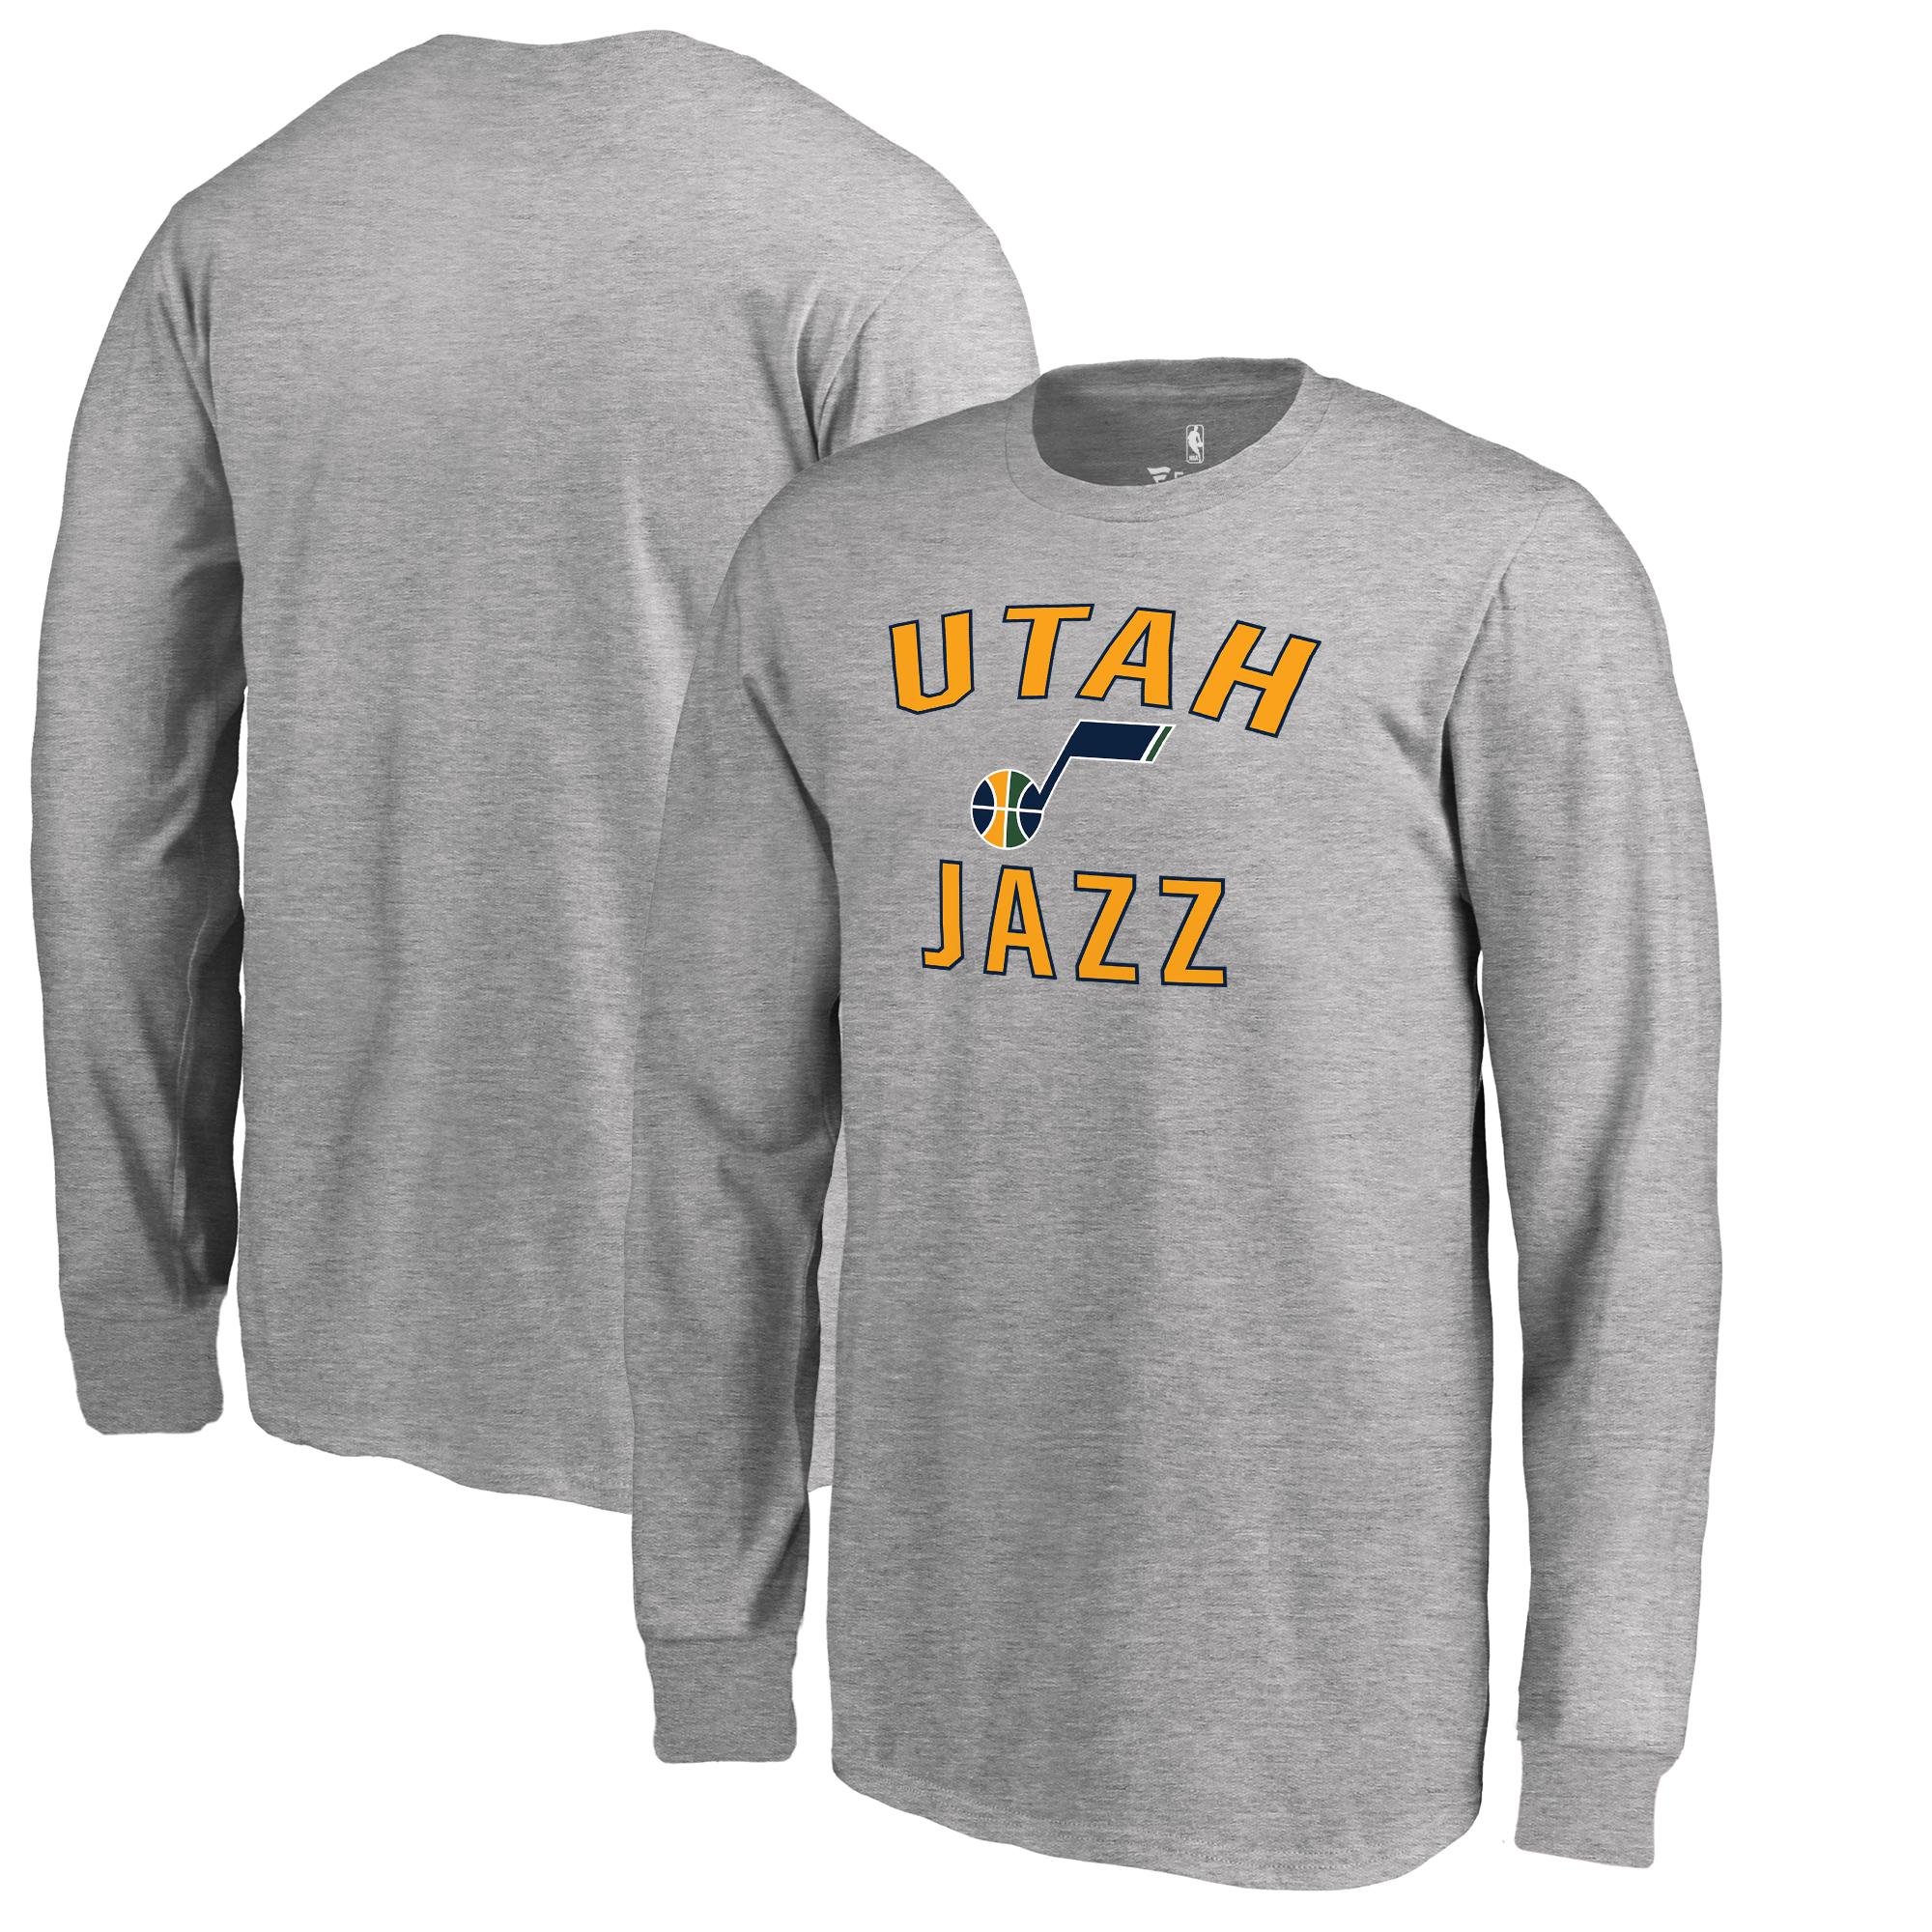 Utah Jazz Fanatics Branded Youth Victory Arch Long Sleeve T-Shirt - Heathered Gray